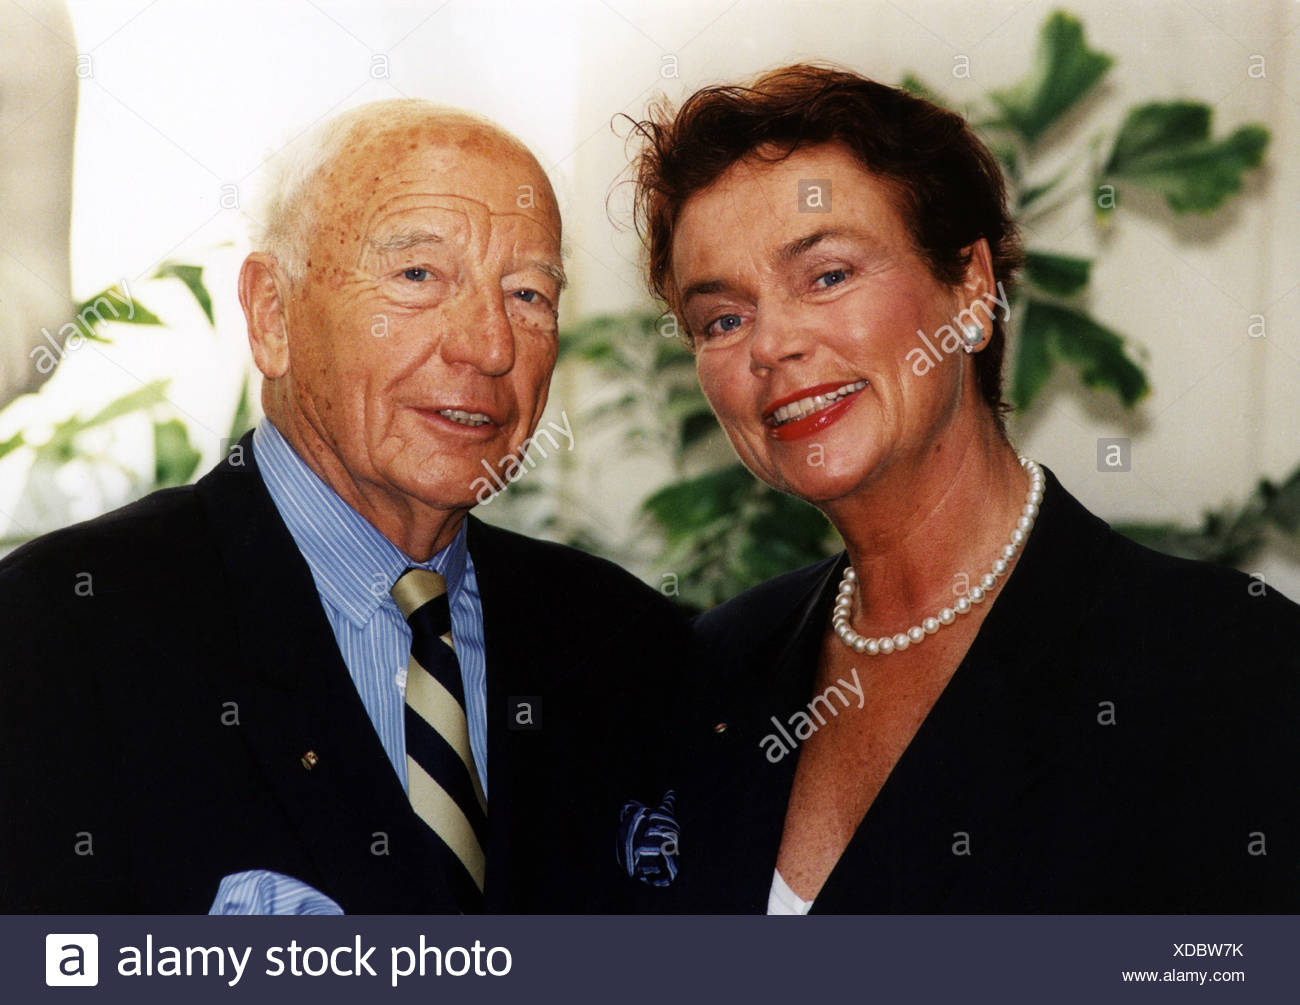 Scheel Walter * 8.7.1919, German politician (FDP), portrait, with his wife Barbara, on occasion of his 60th birthday in Berlin, Stockbild